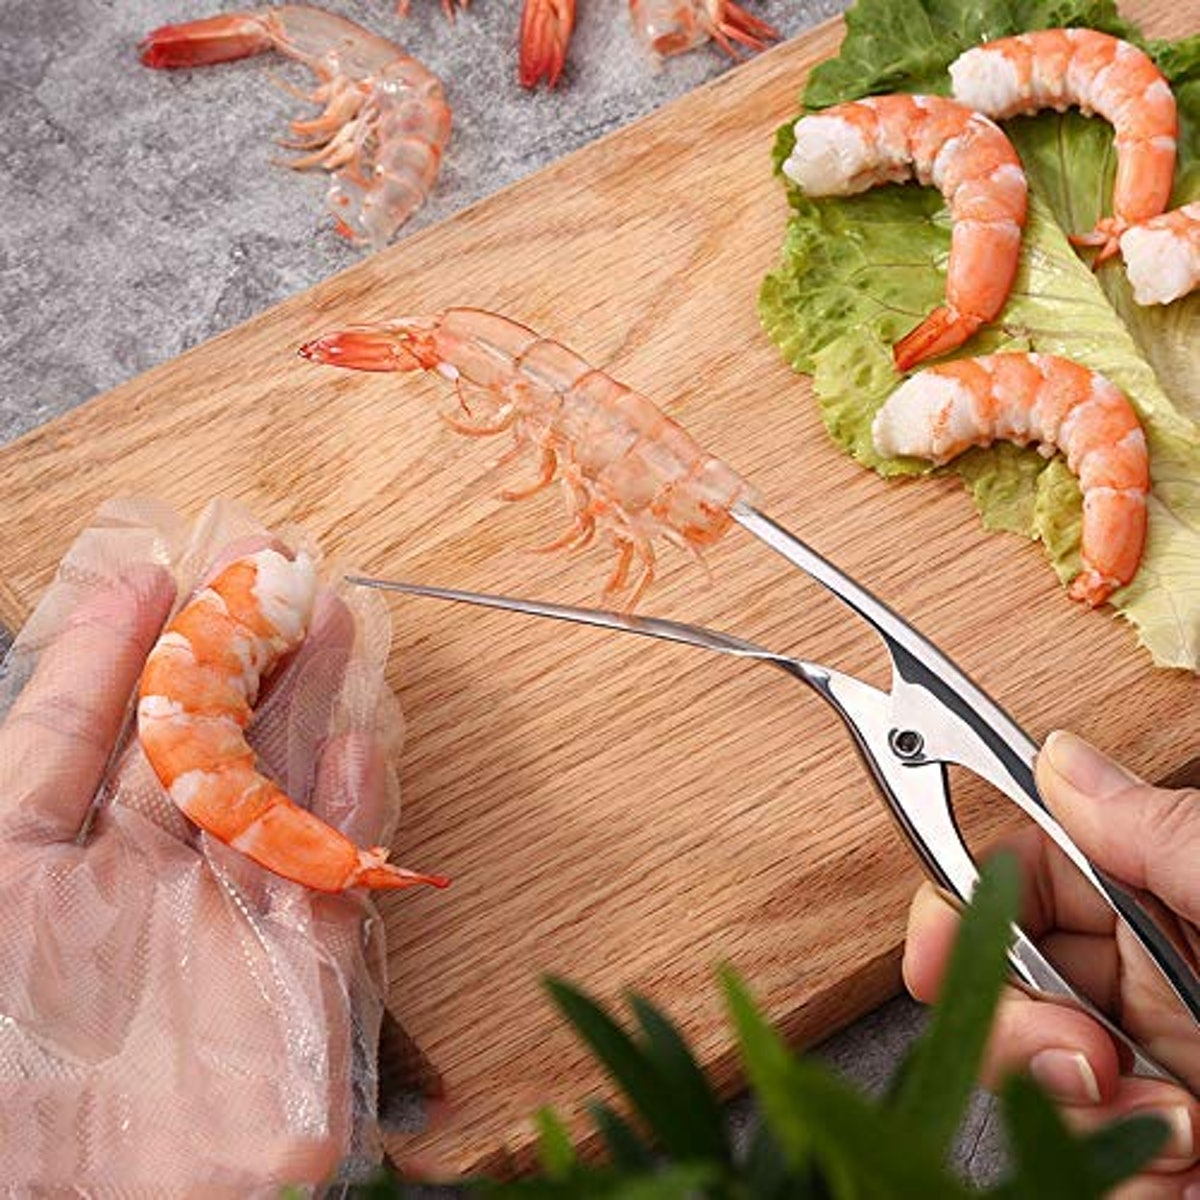 ELEDUCTMON Shrimp Deveiner and Peeler